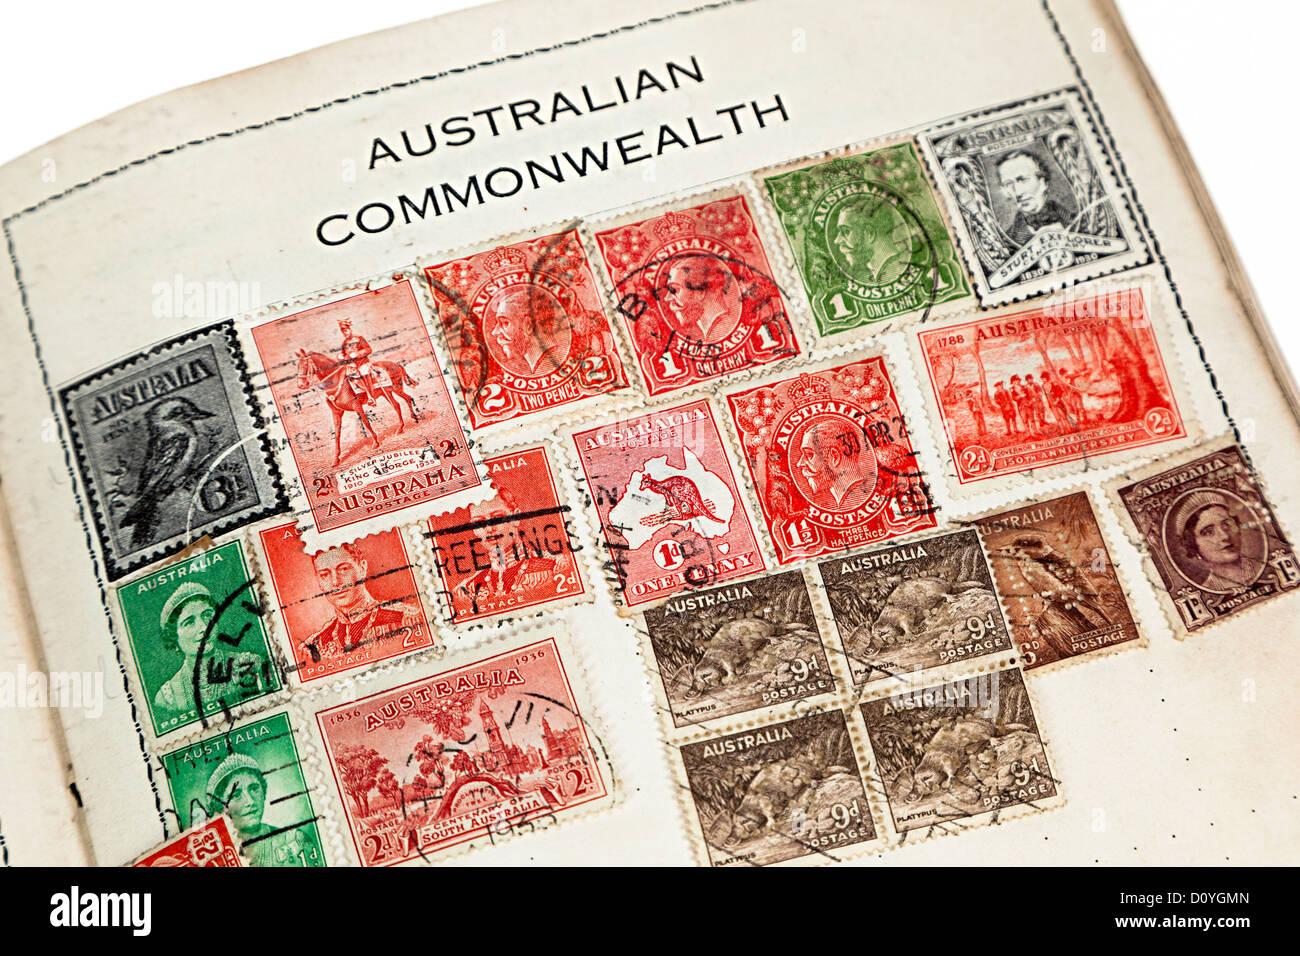 Old stamp album with Australian Commonwealth heading, UK - Stock Image